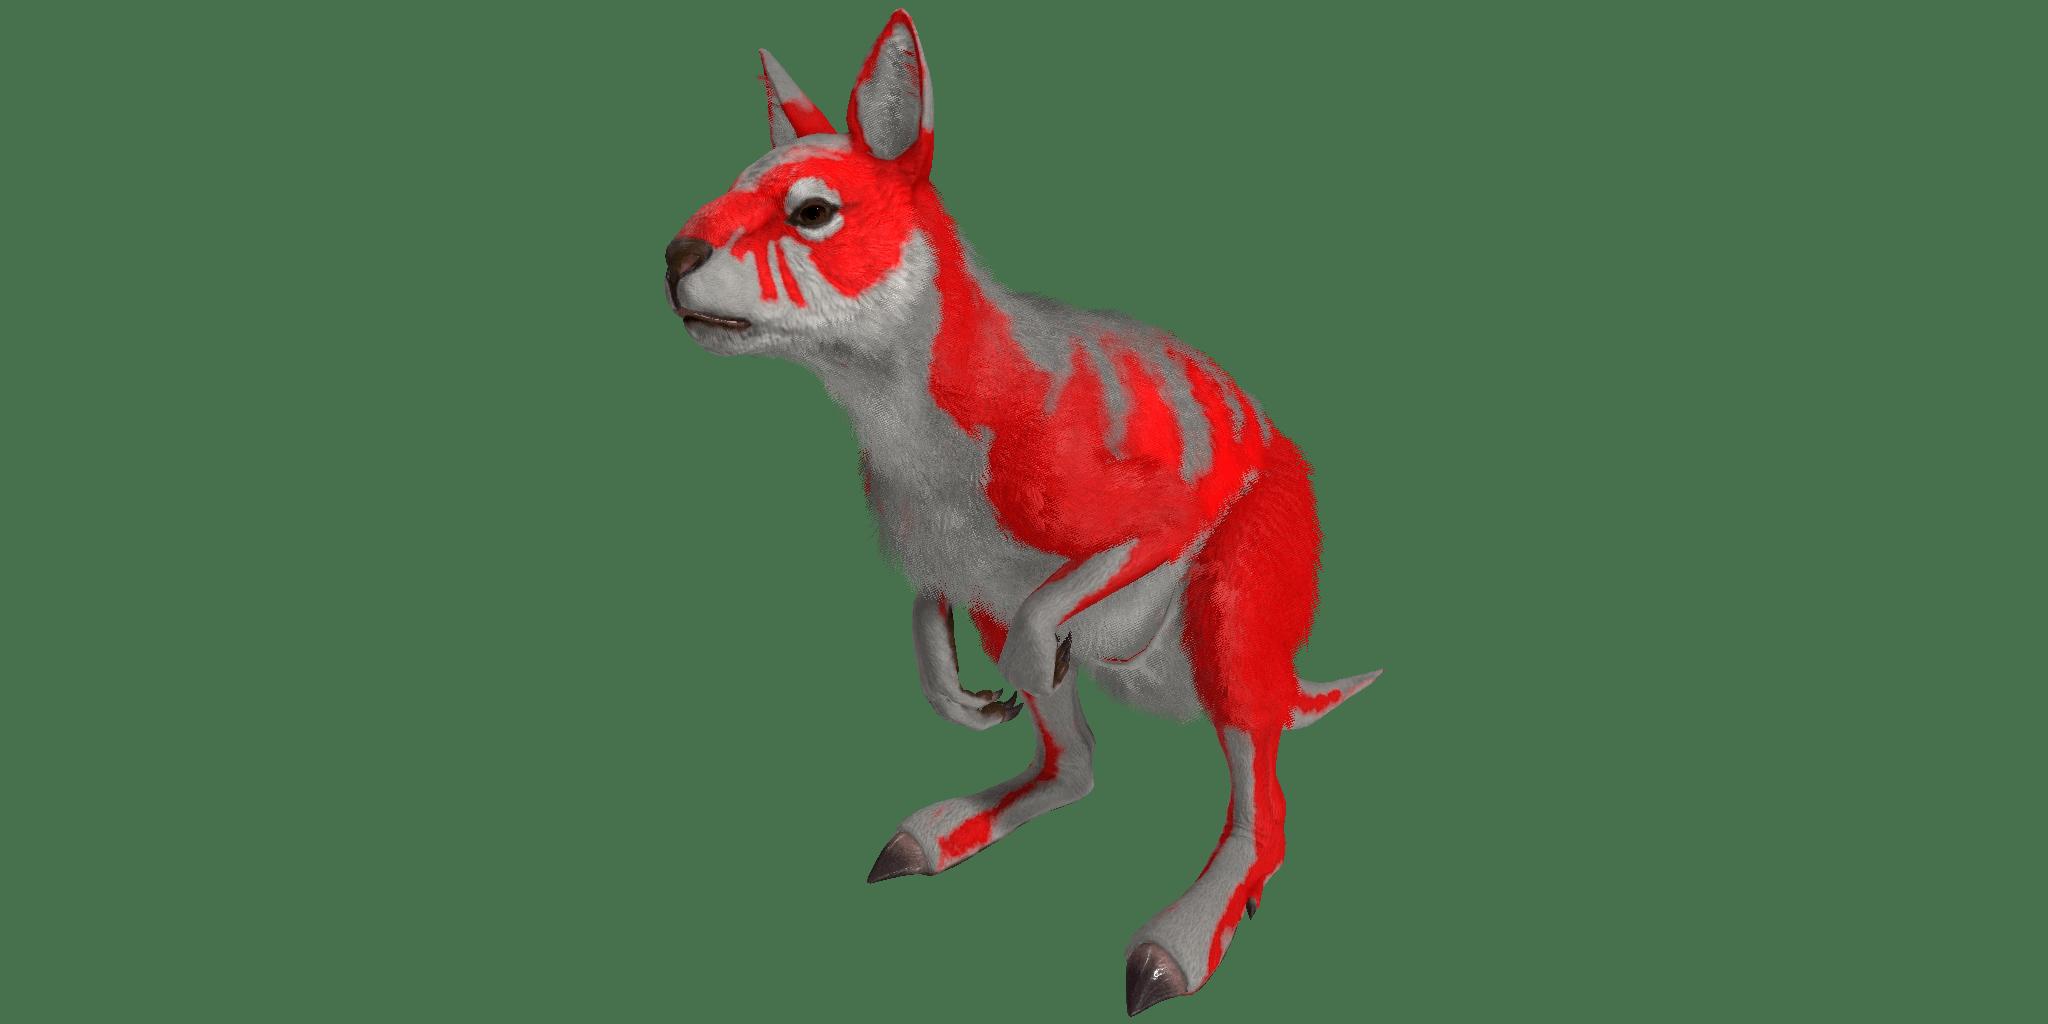 Procoptodon Official ARK Survival Evolved Wiki